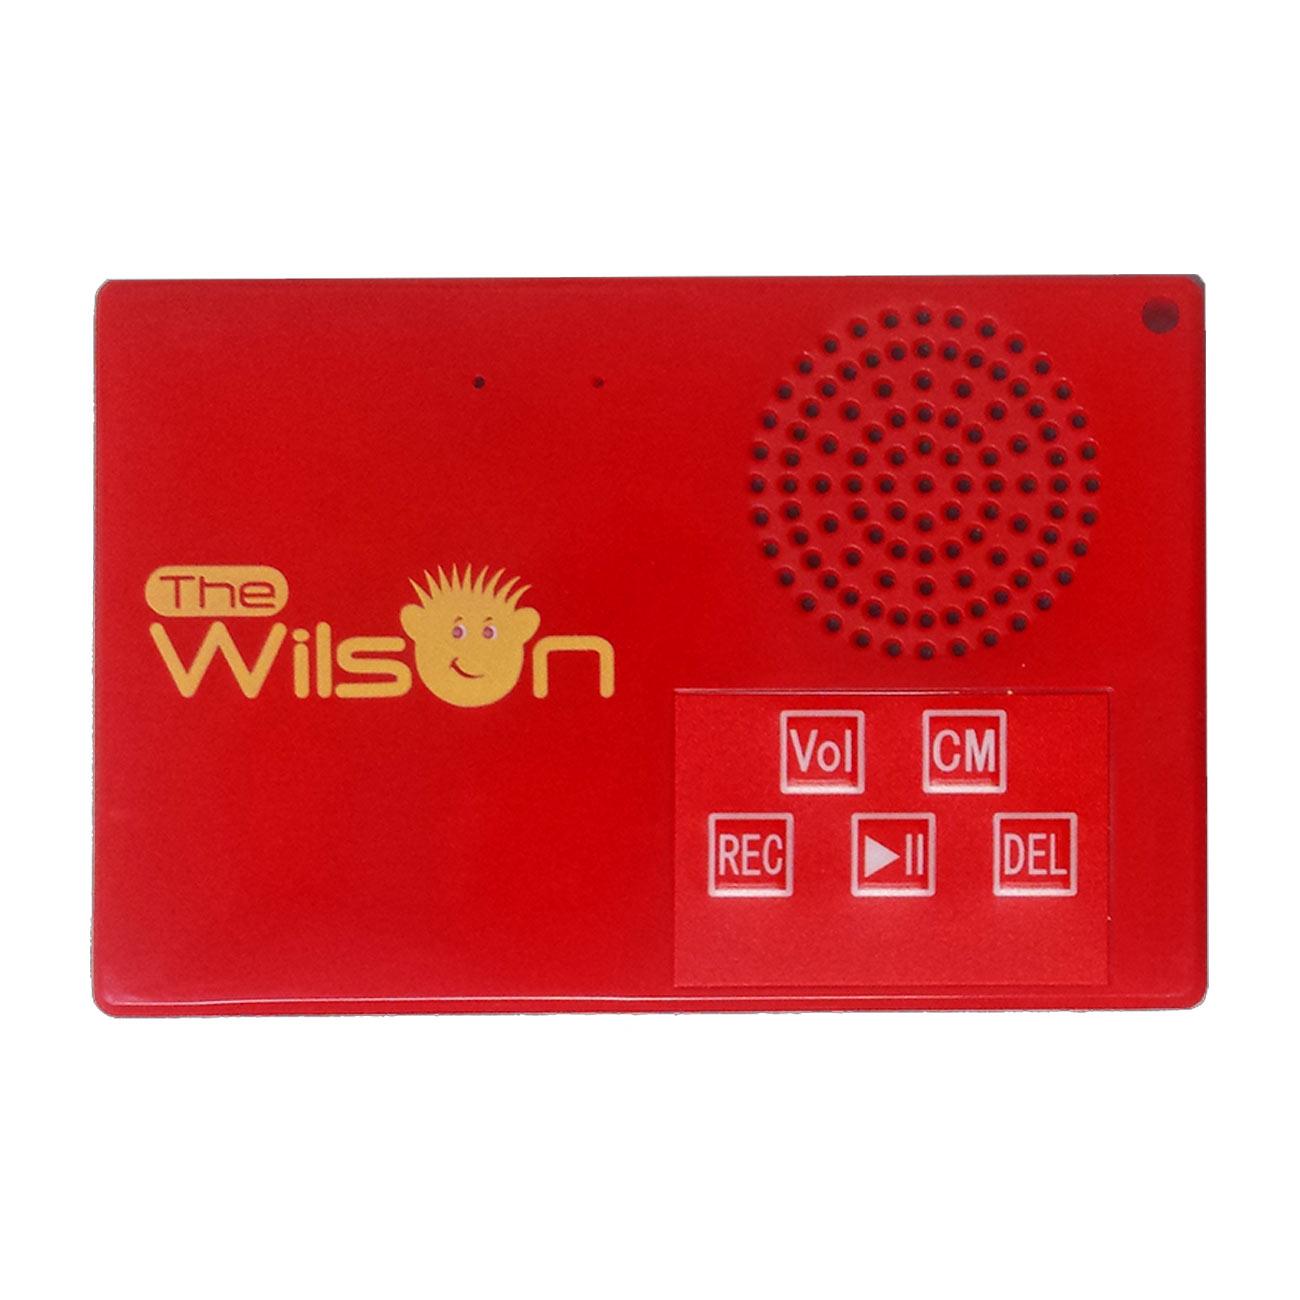 The Mini Wilson Compact Digital Recorder Version 3